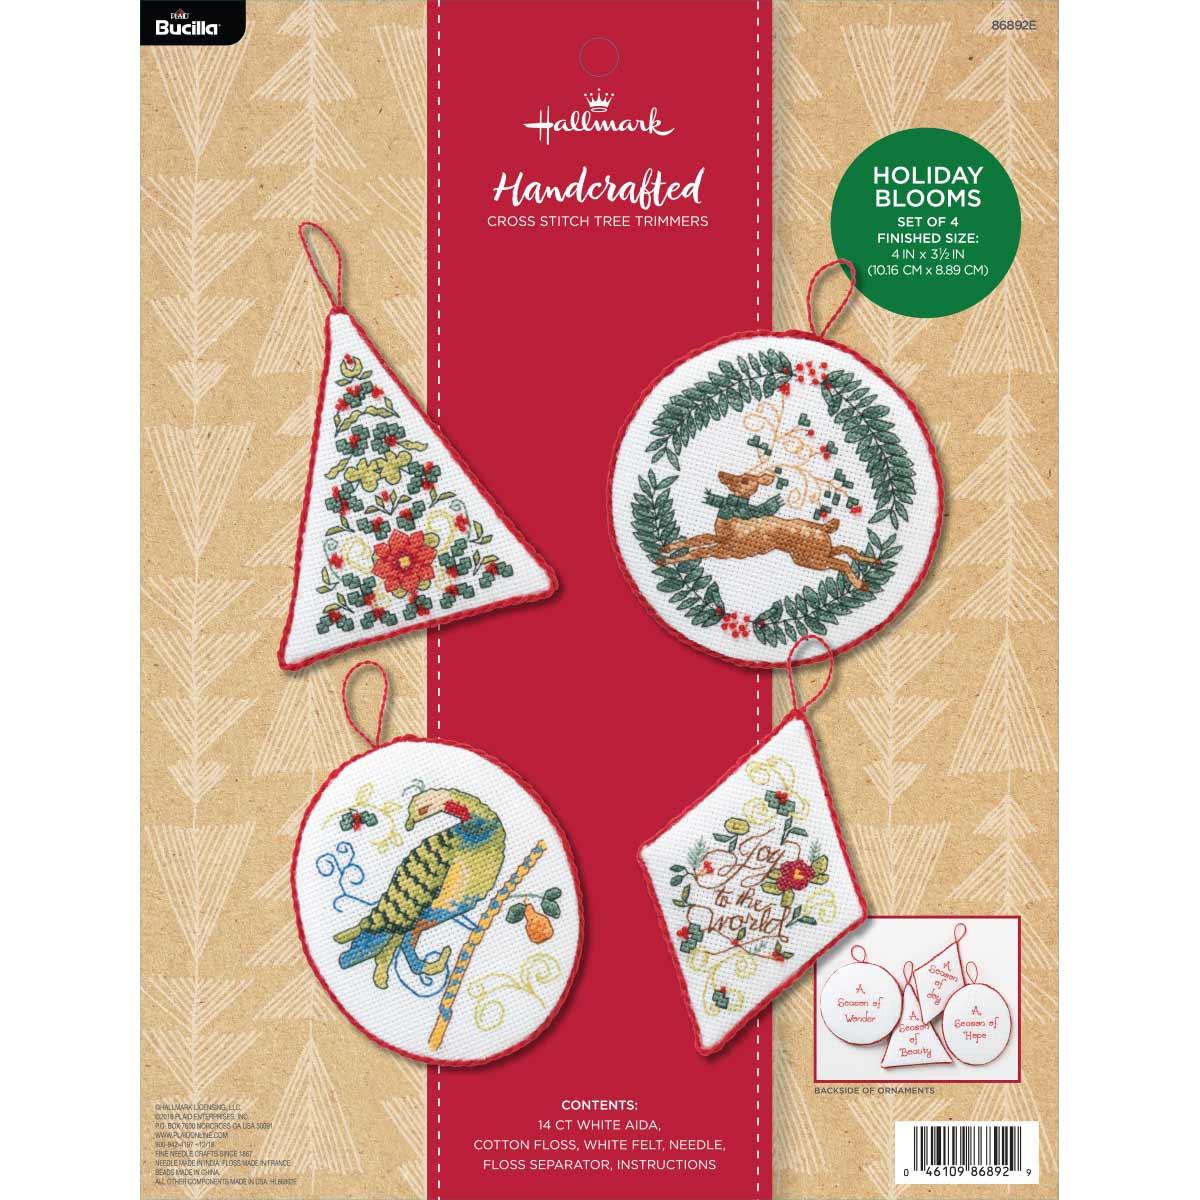 Bucilla ® Seasonal - Counted Cross Stitch - Tree Trimmer Kits - Hallmark - Holiday Blooms - 86892E